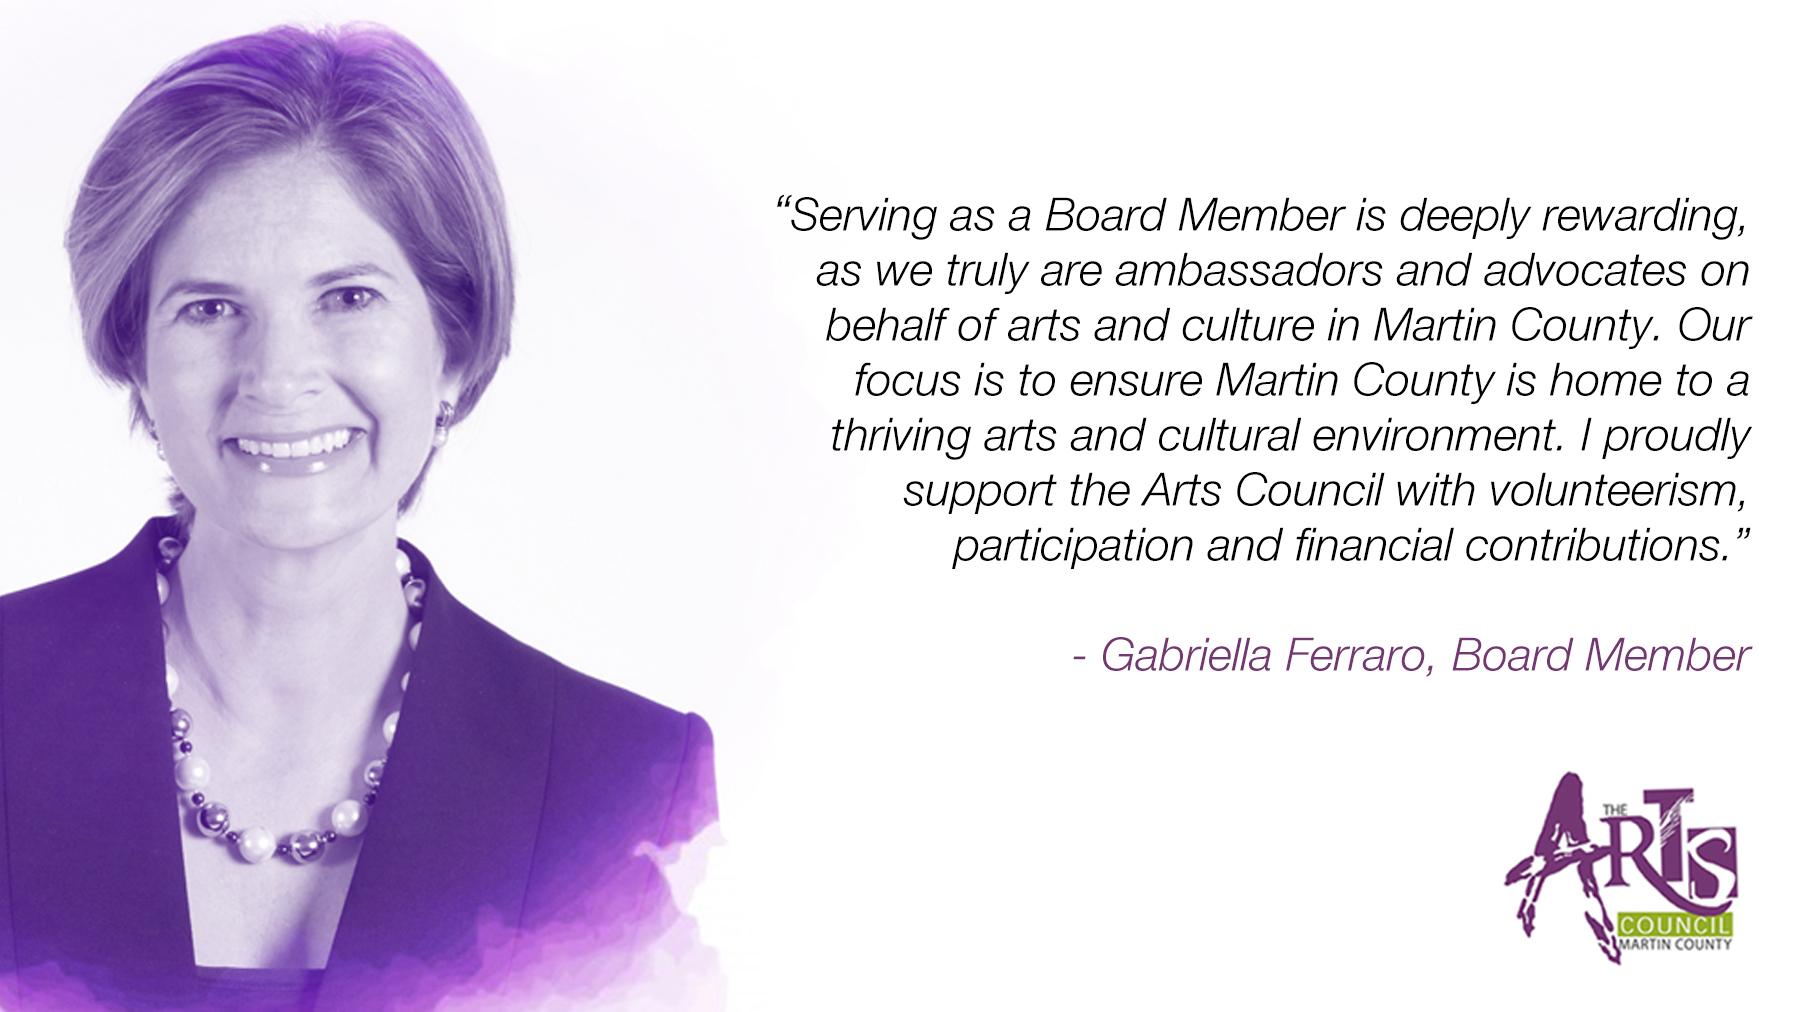 Gabriella Ferraro